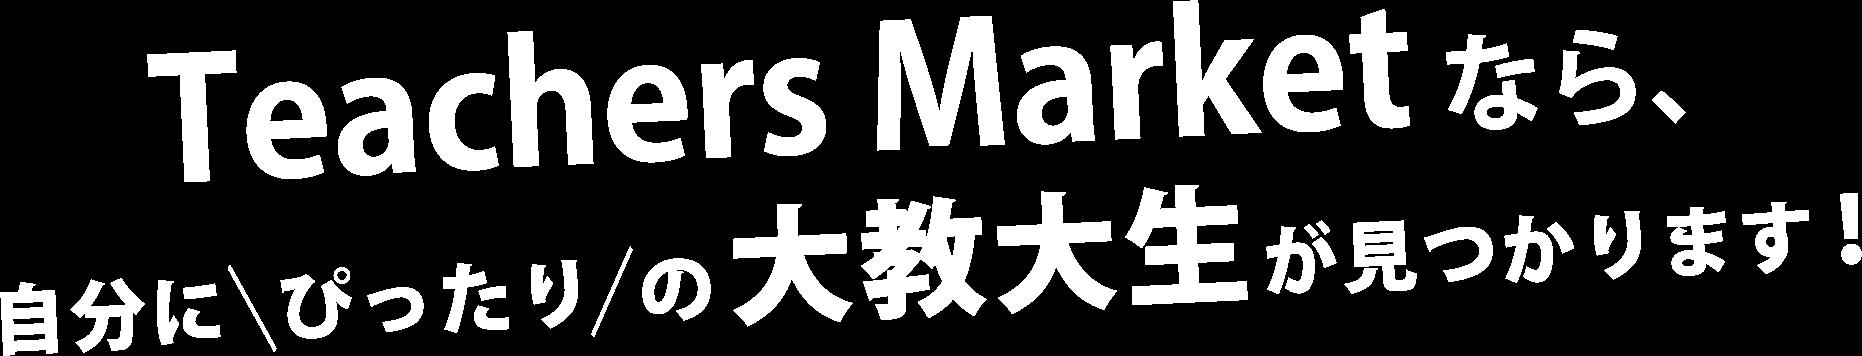 Teachers Marketなら、自分にぴったりの大阪教育大学生が見つかります!